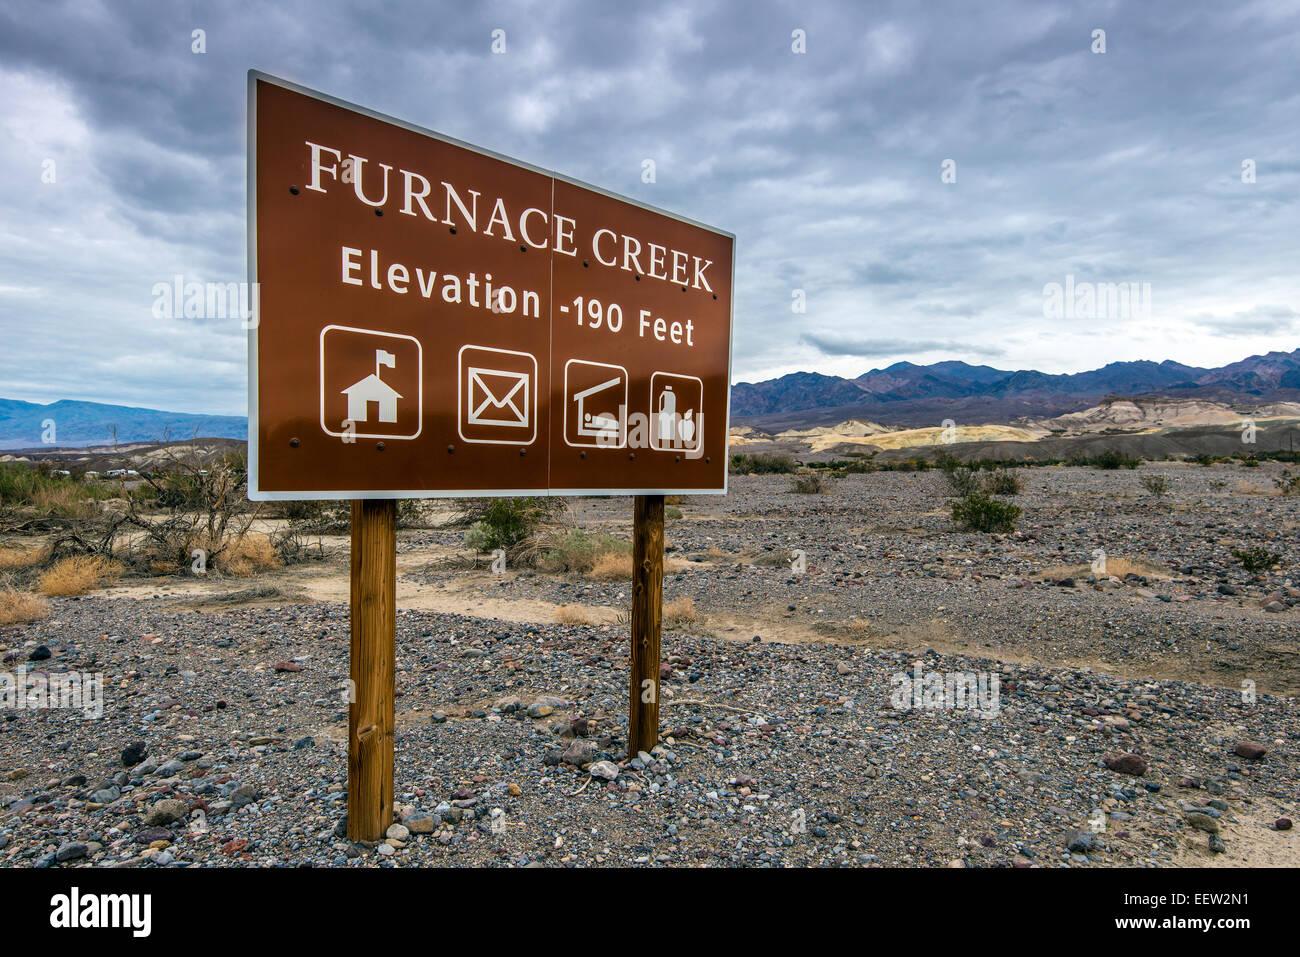 Furnace Creek elevation -190 feet sign, Furnace Creek, Death Valley National Park, California, USA - Stock Image